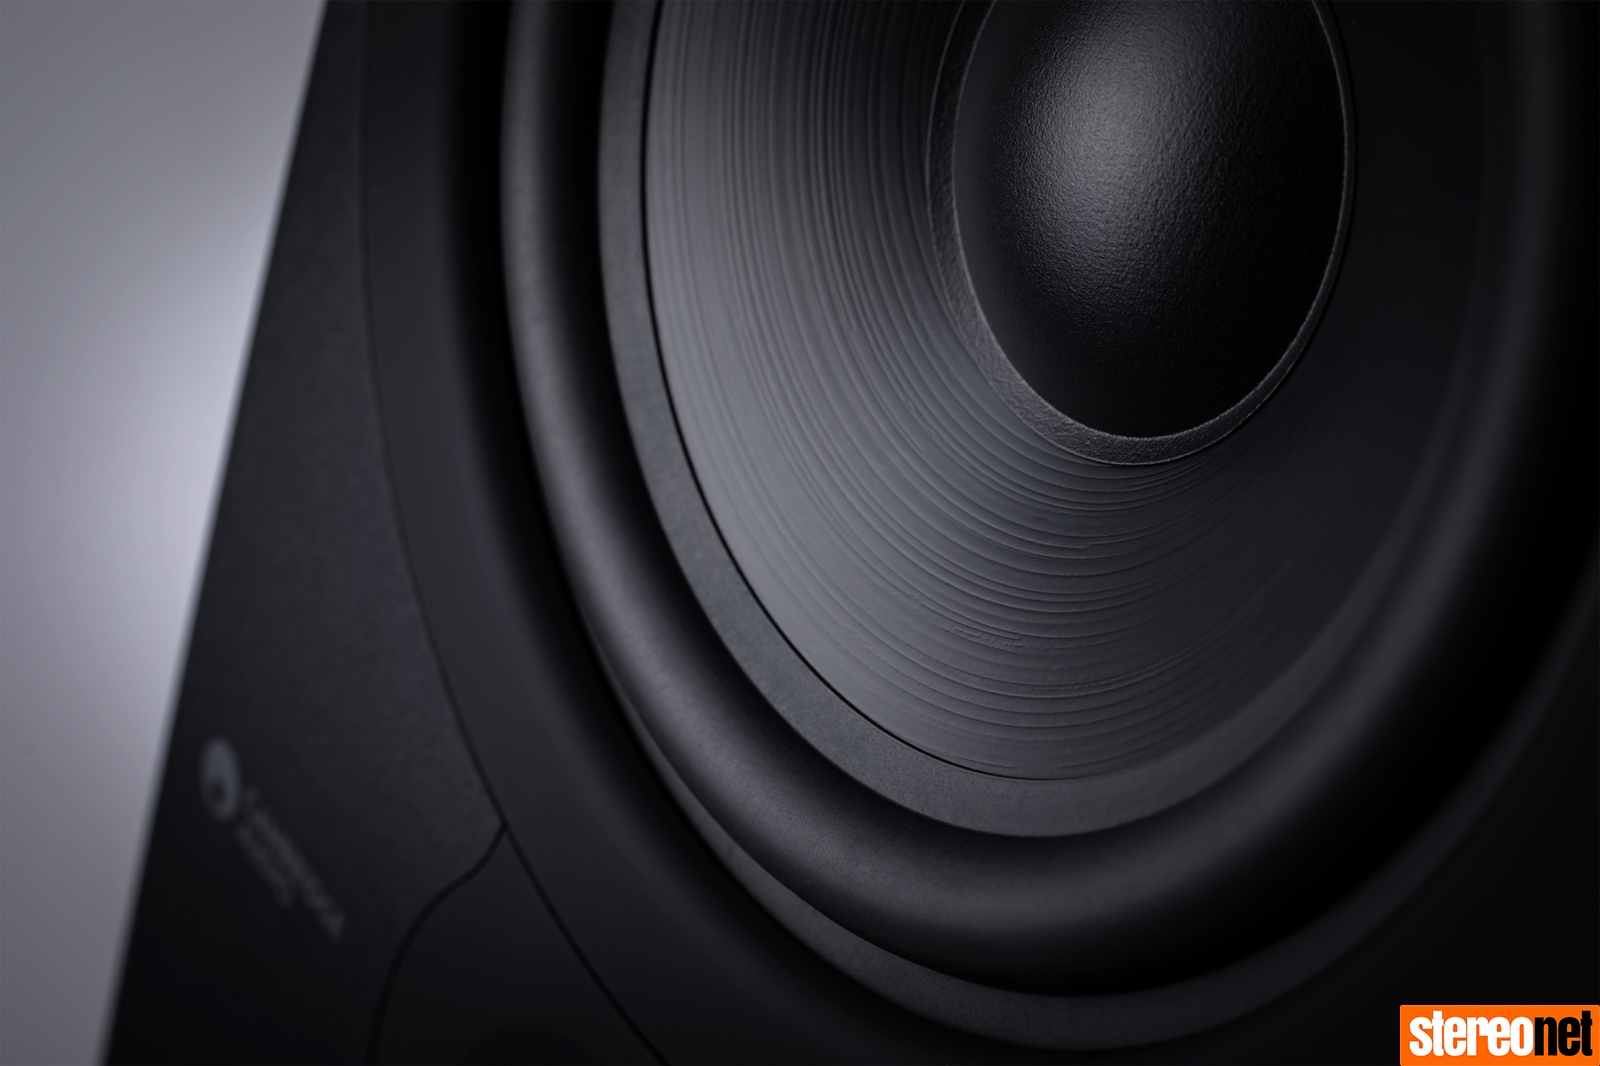 Cambridge Audio SX-80 Review